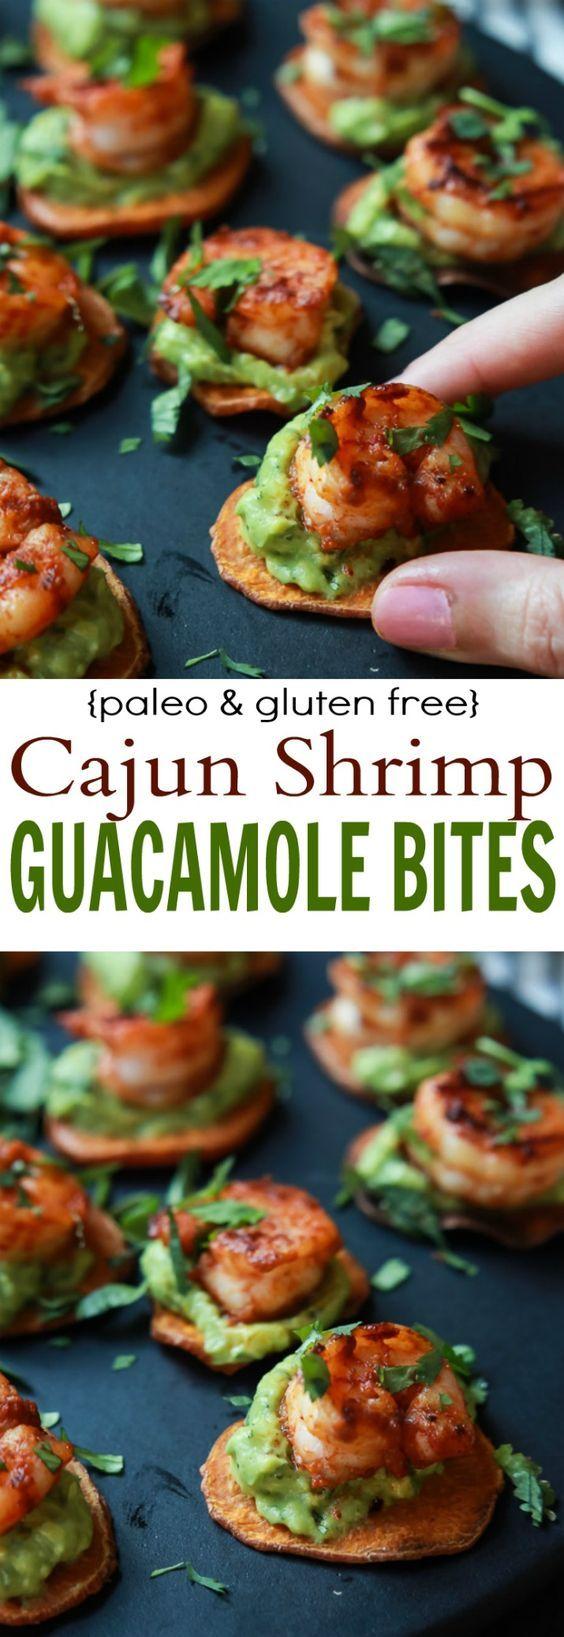 Cajun Shrimp Guacamole Bites | Recipe | Cajun shrimp, Spicy and Paleo